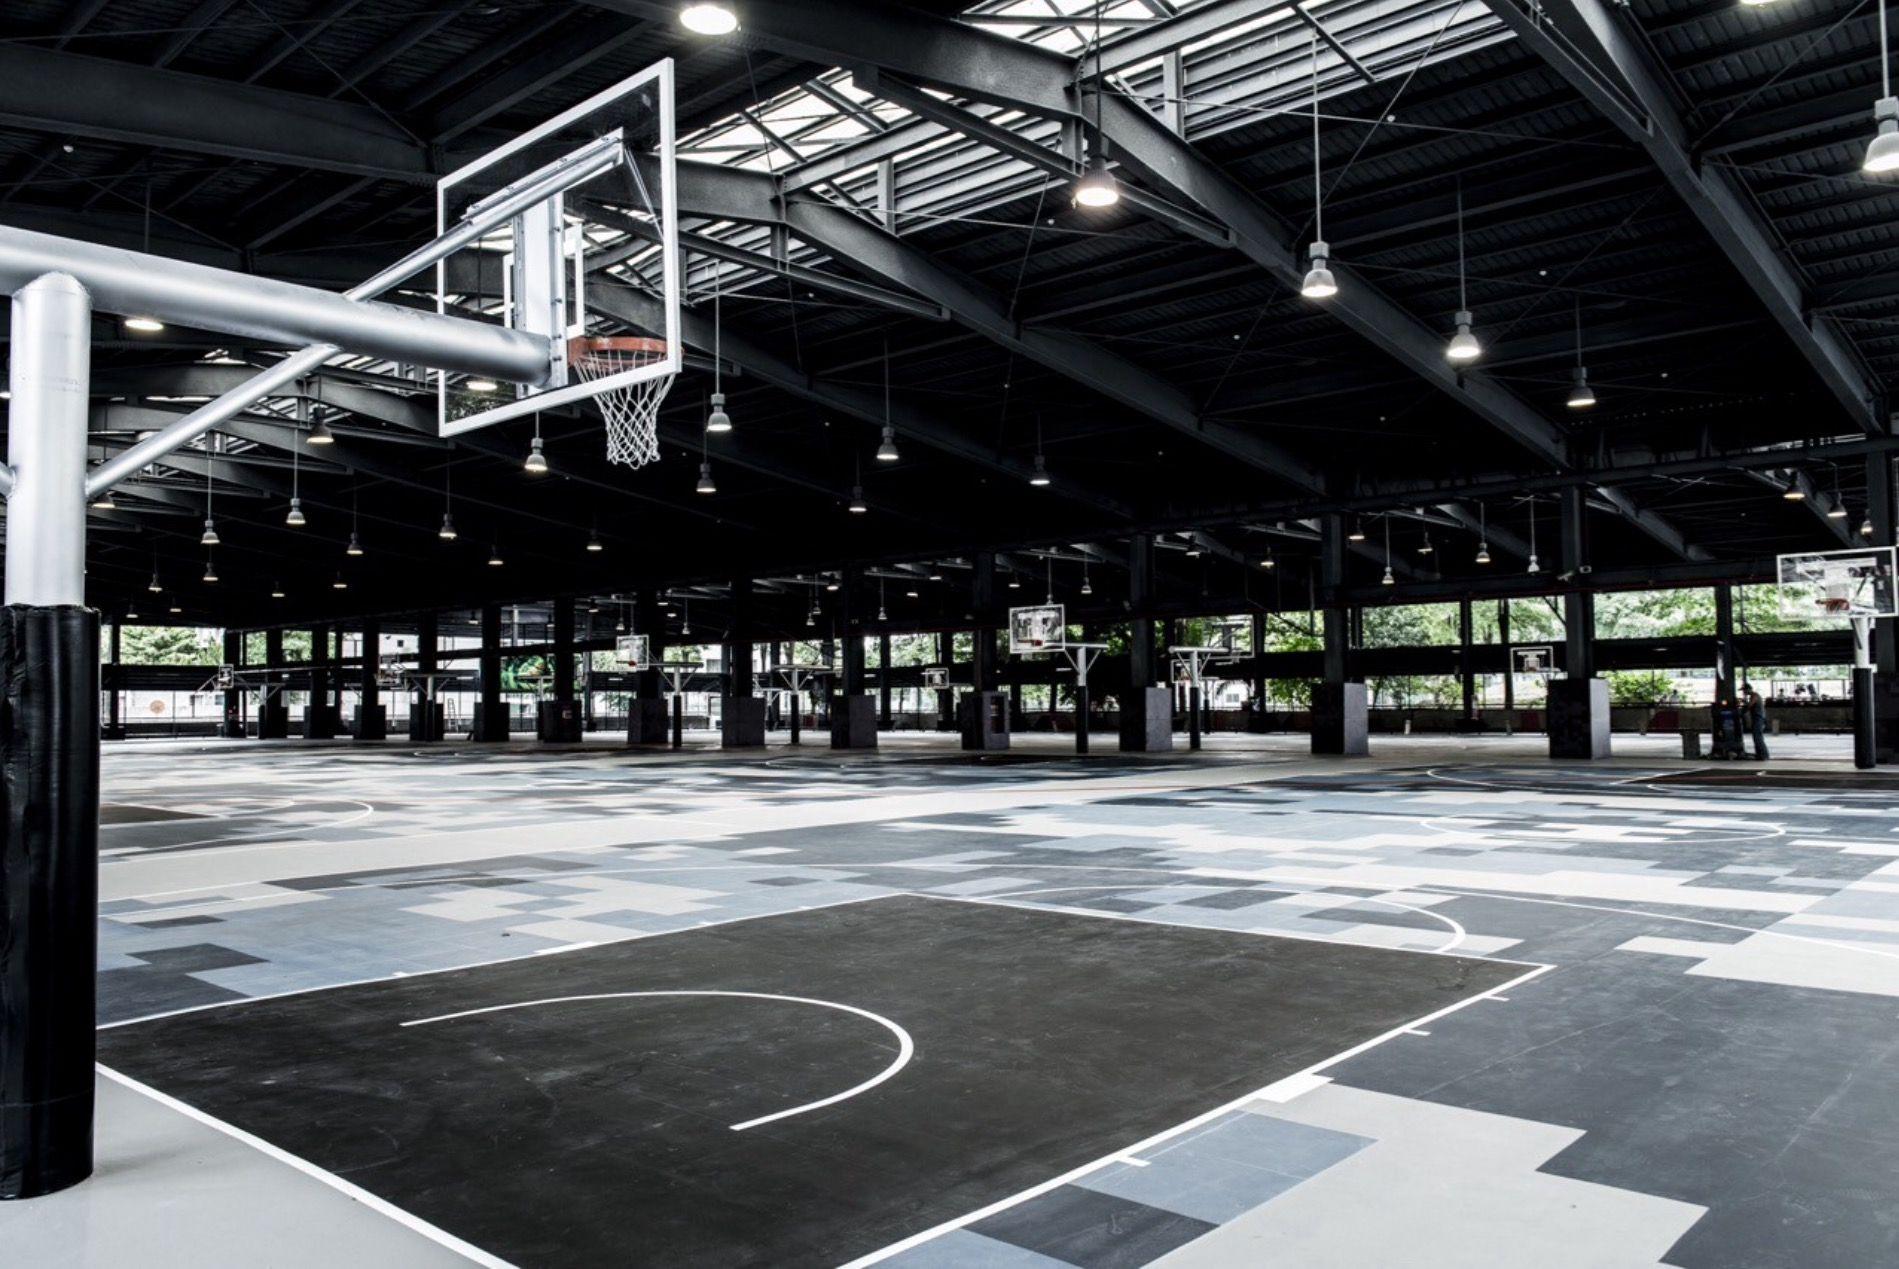 Pin By Sorella Paper Design On Basketball Courts Home Basketball Court Indoor Basketball Court Indoor Basketball